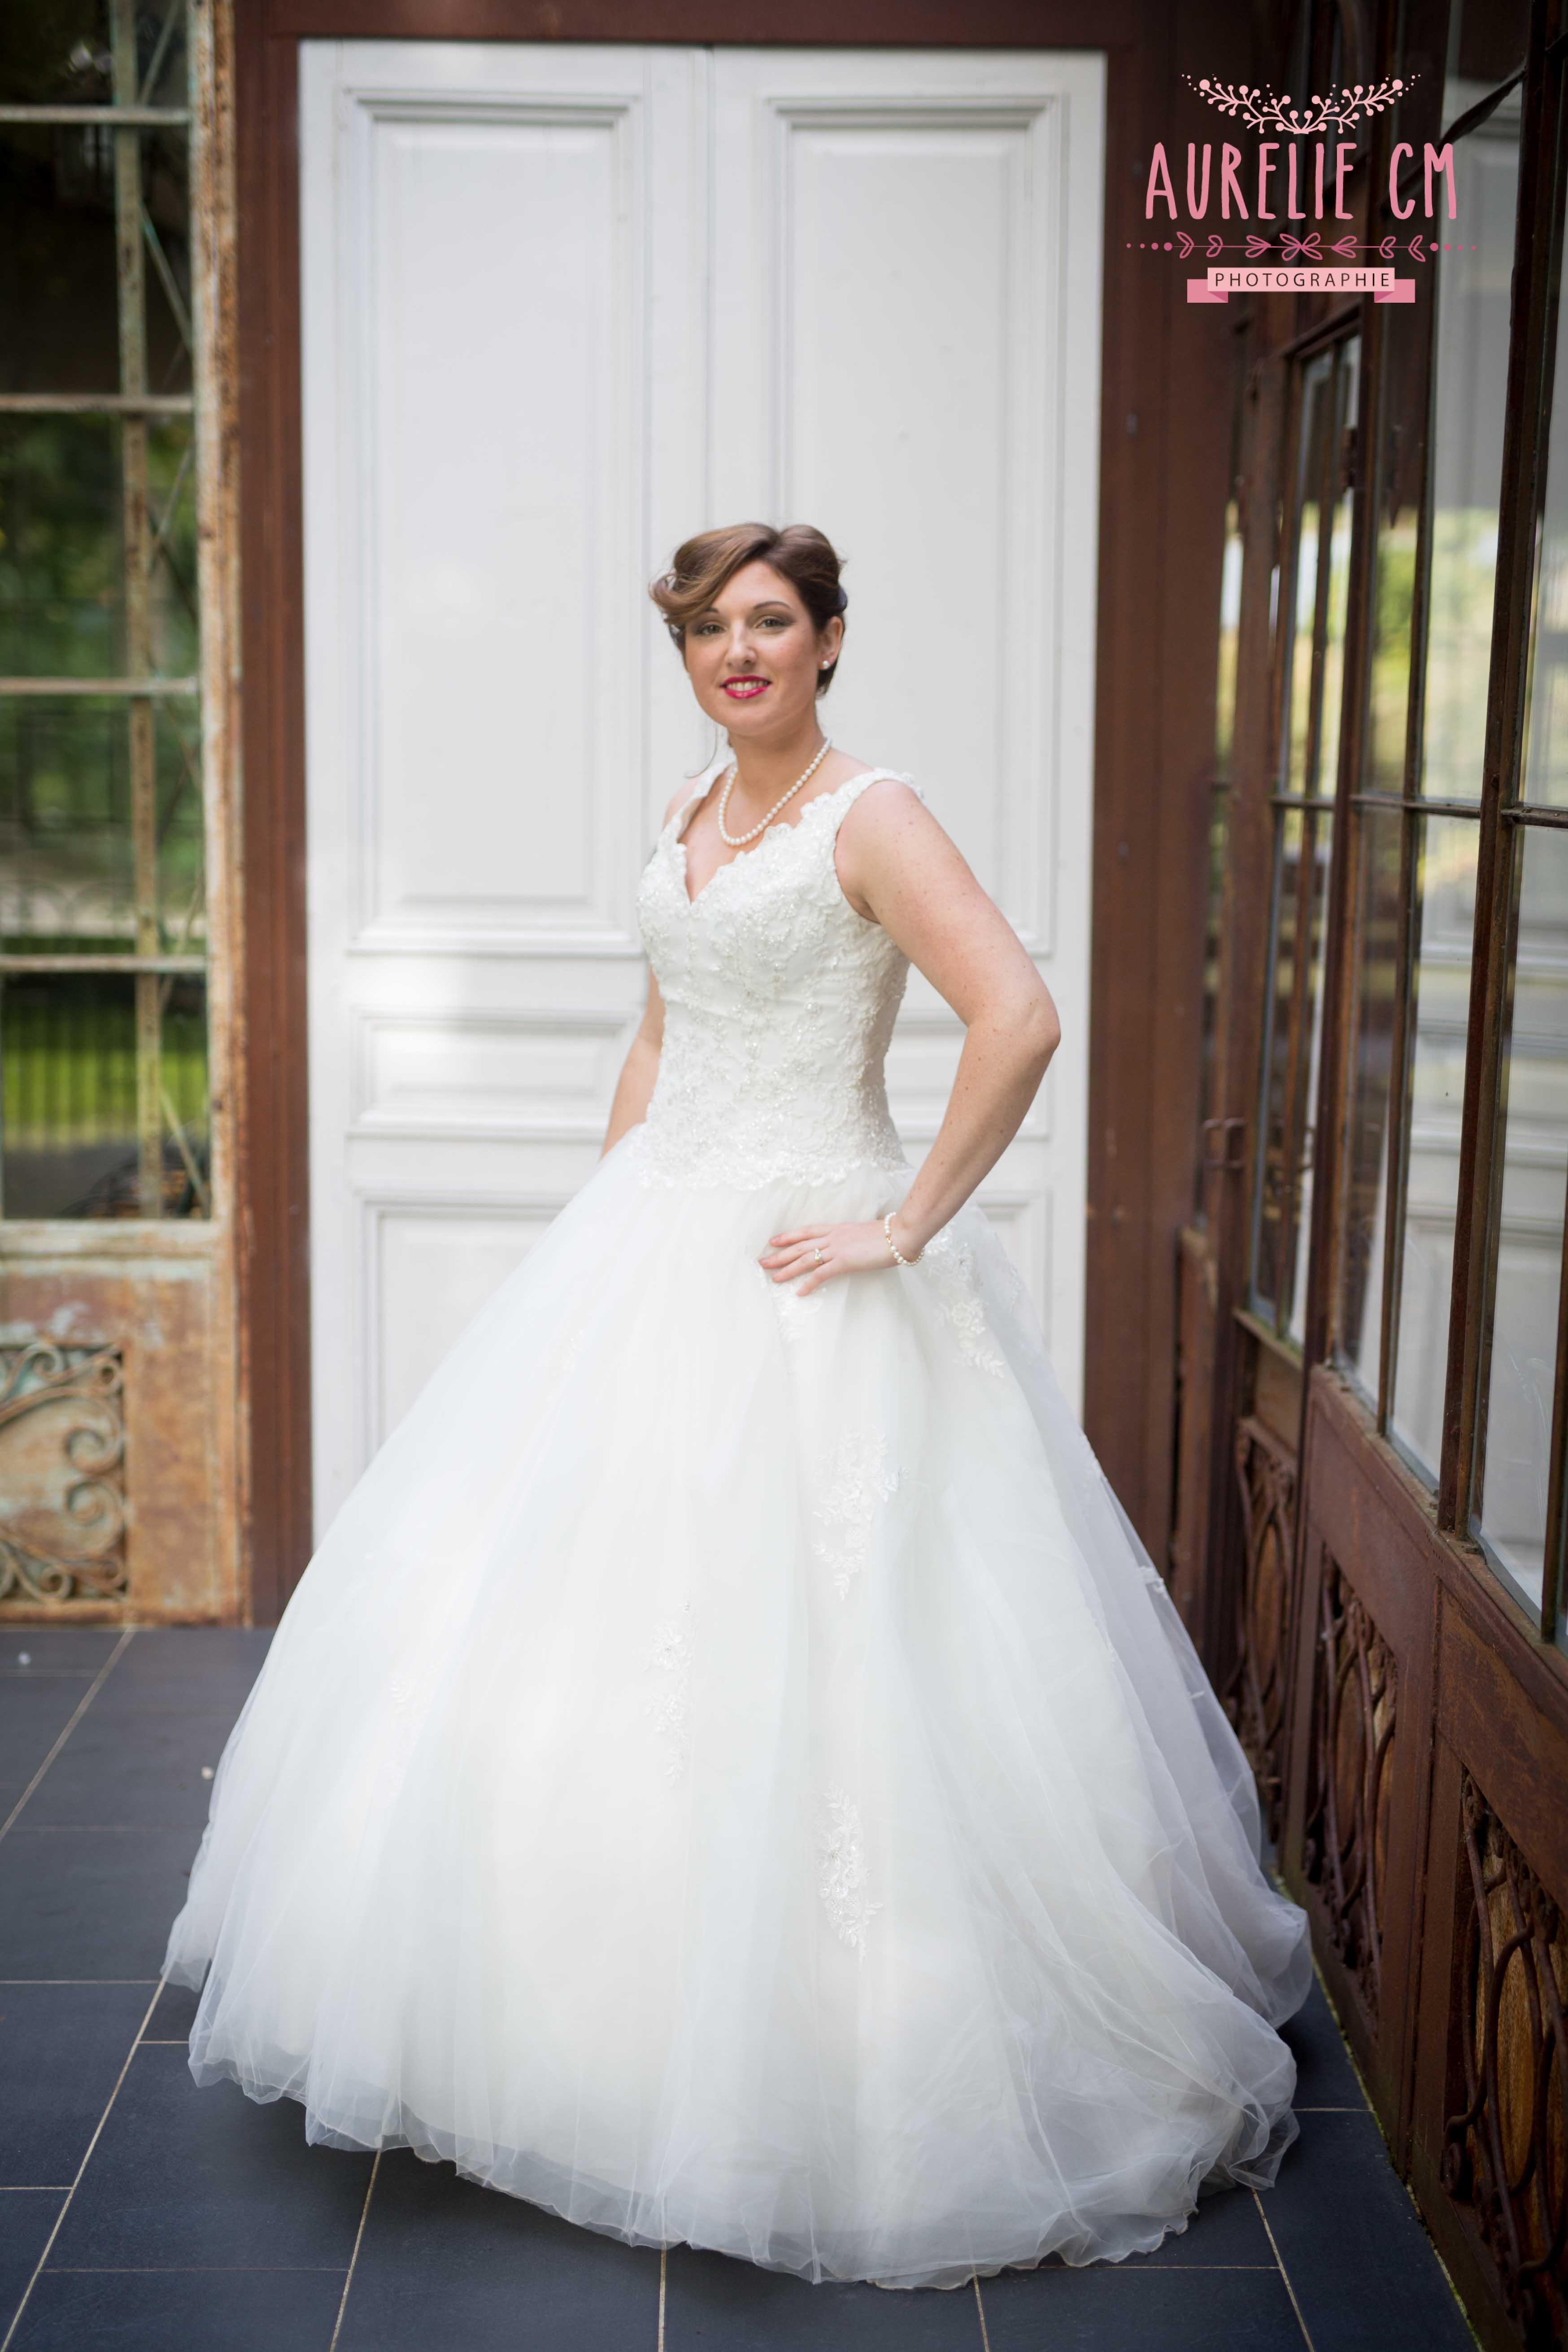 Photographe mariage yvetot